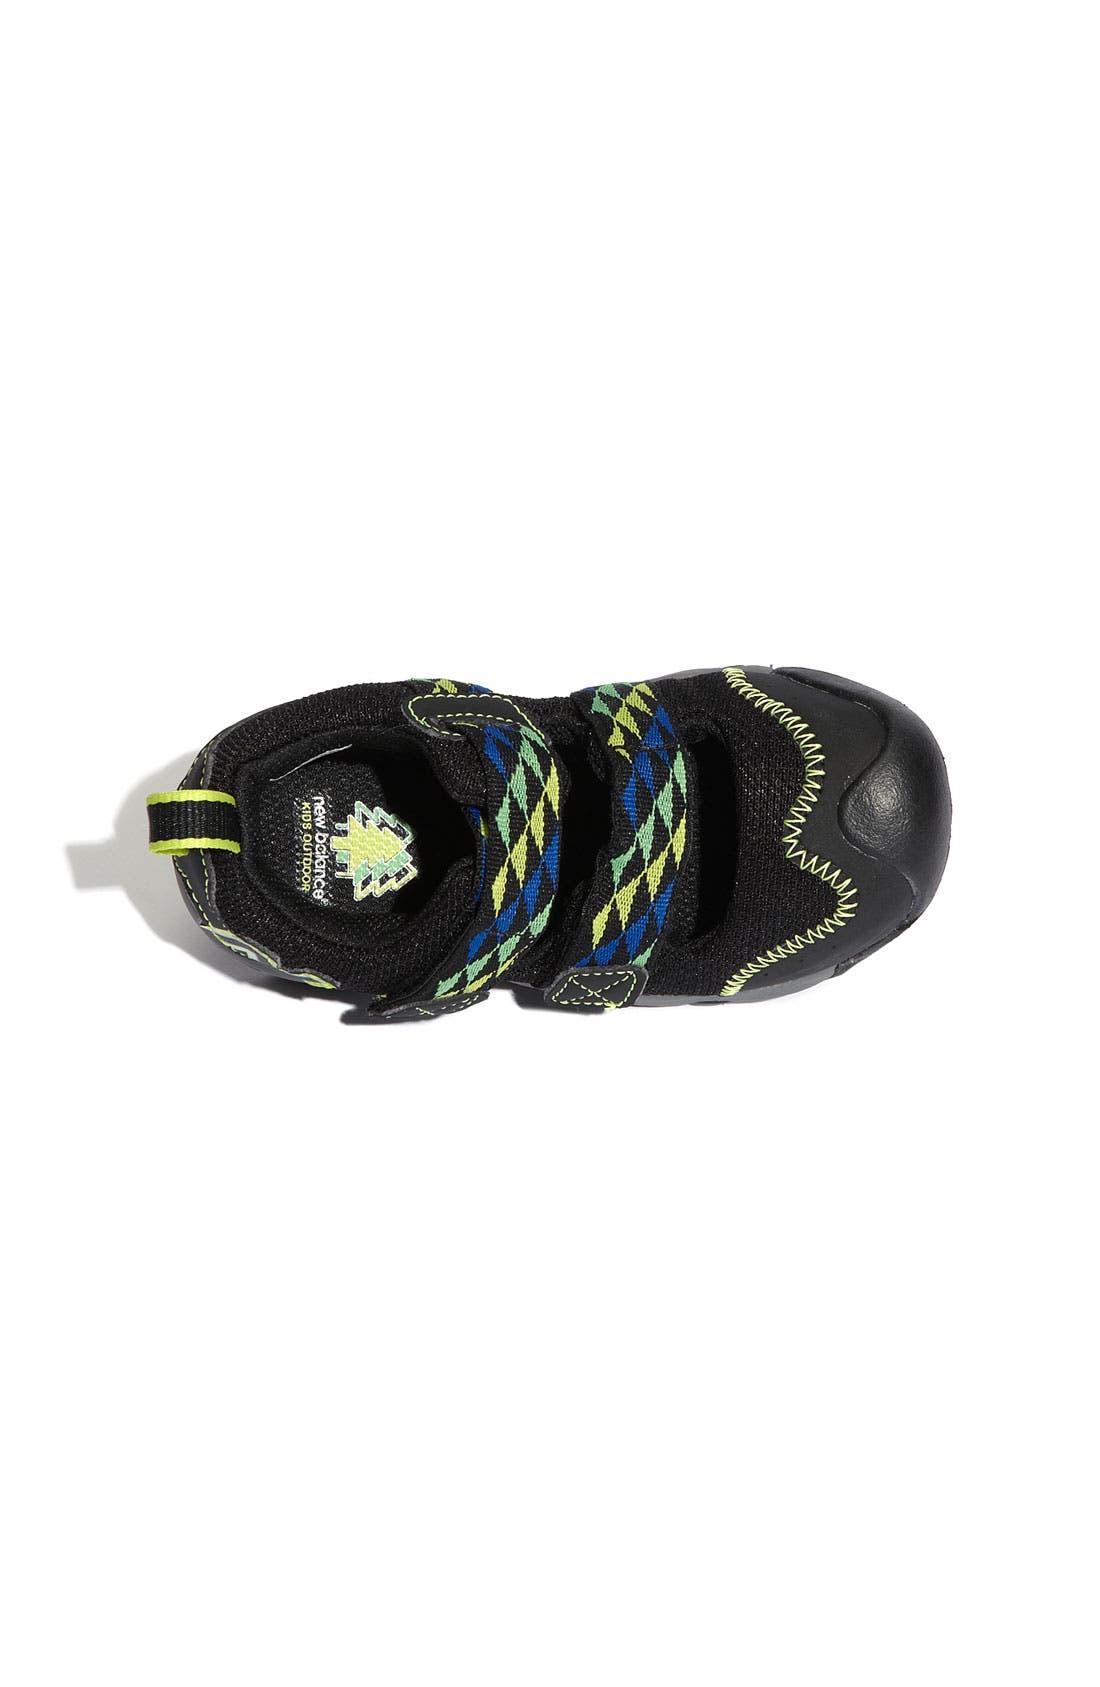 '554' Water Shoe,                             Alternate thumbnail 4, color,                             001